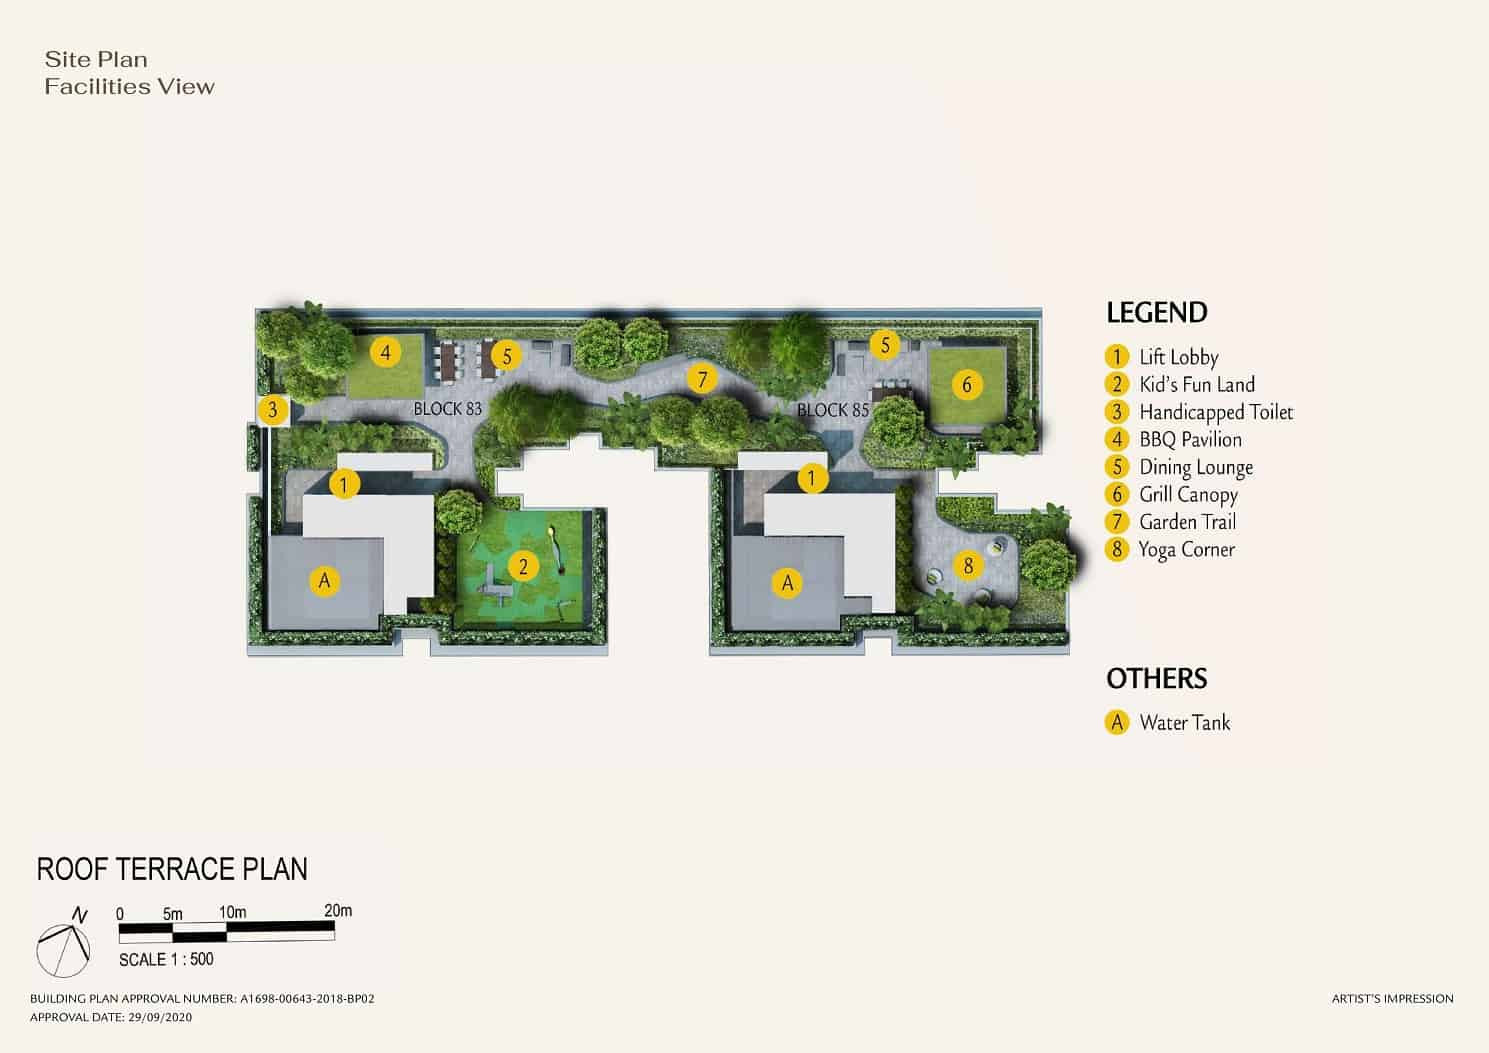 Phoenix Residences Site Plan Roof Terrac